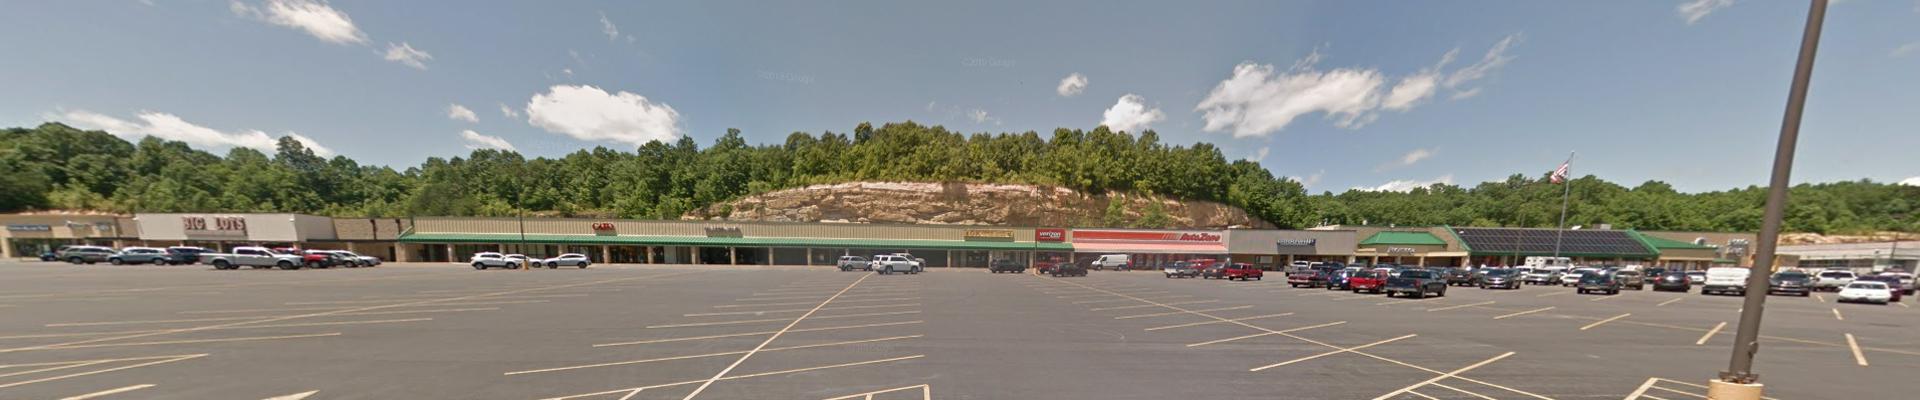 Fayette Square Shopping Center – Oak Hill, West Virginia